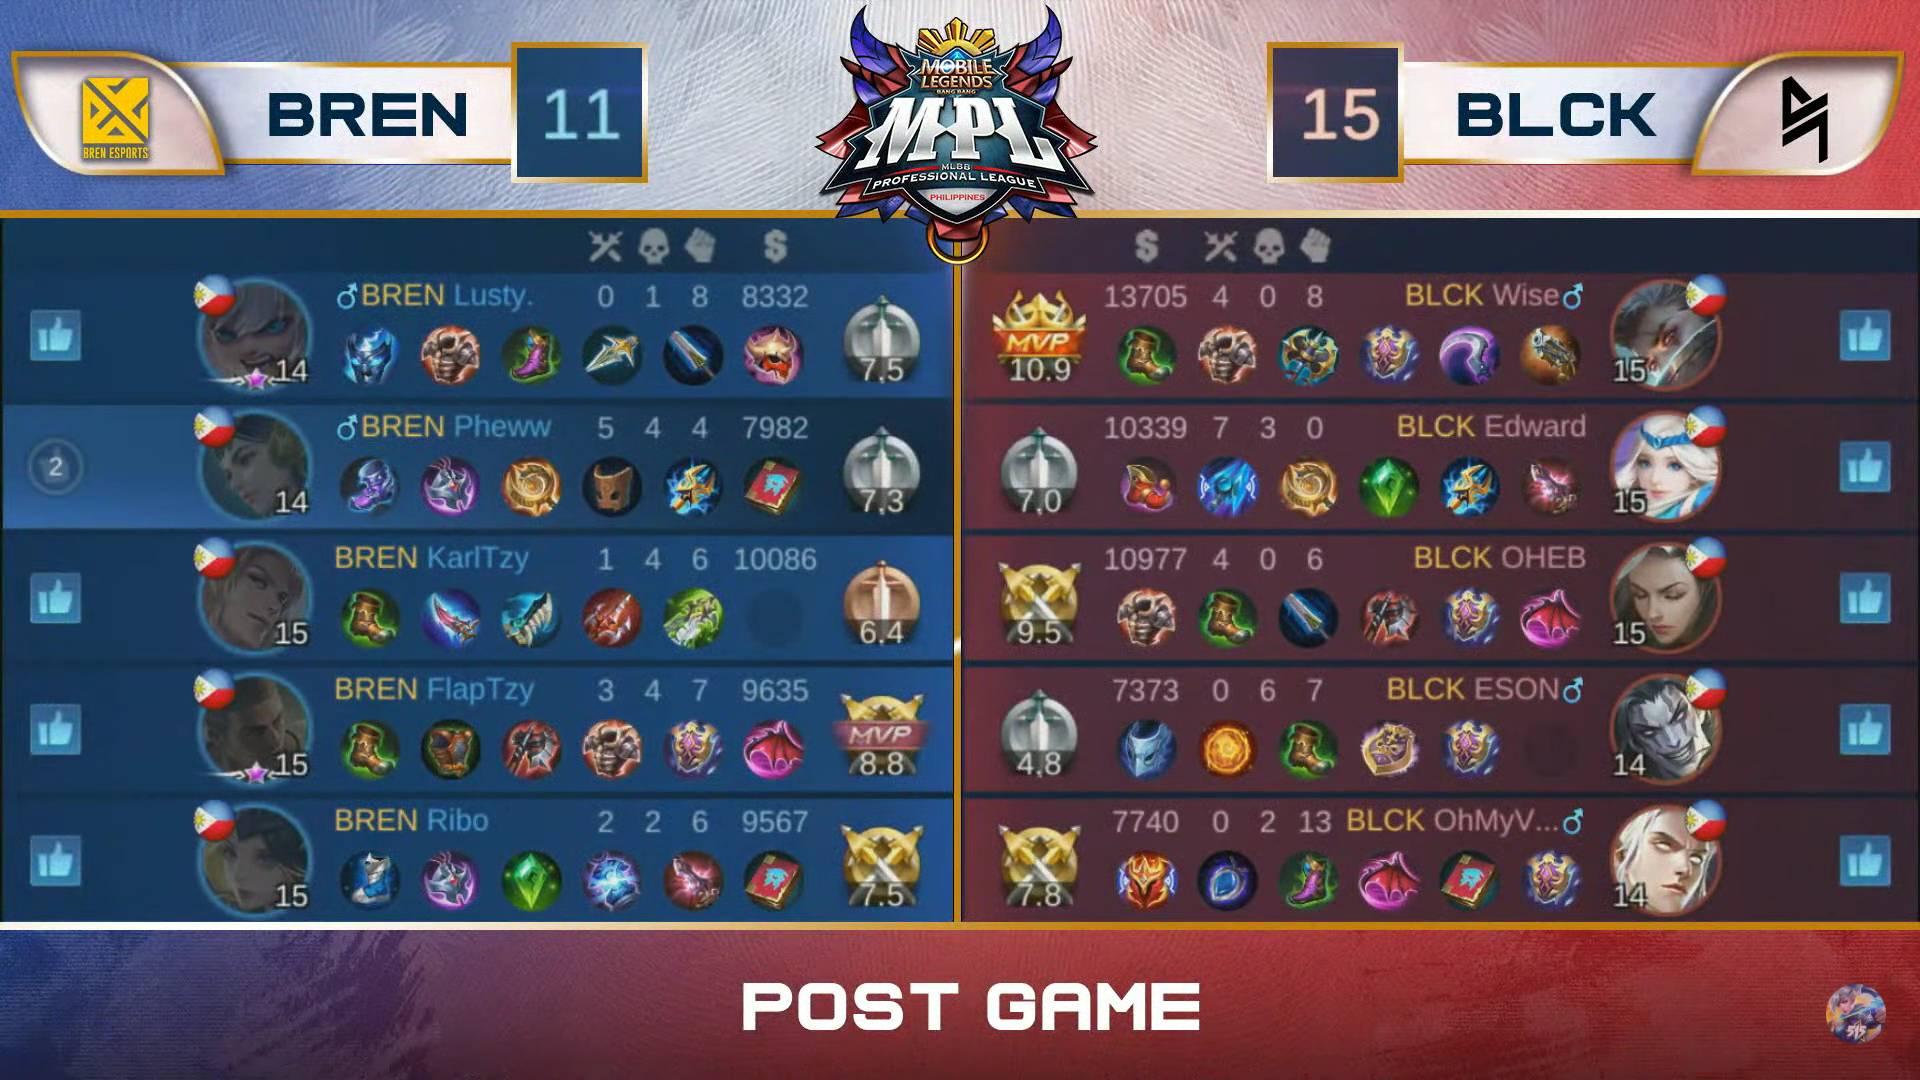 MPL-PH-Season-7-Bren-def-Blacklist-Game-1 Lusty clutch knock-up triggers Bren's statement comeback vs Blacklist in MPL PH ESports Mobile Legends MPL-PH News  - philippine sports news